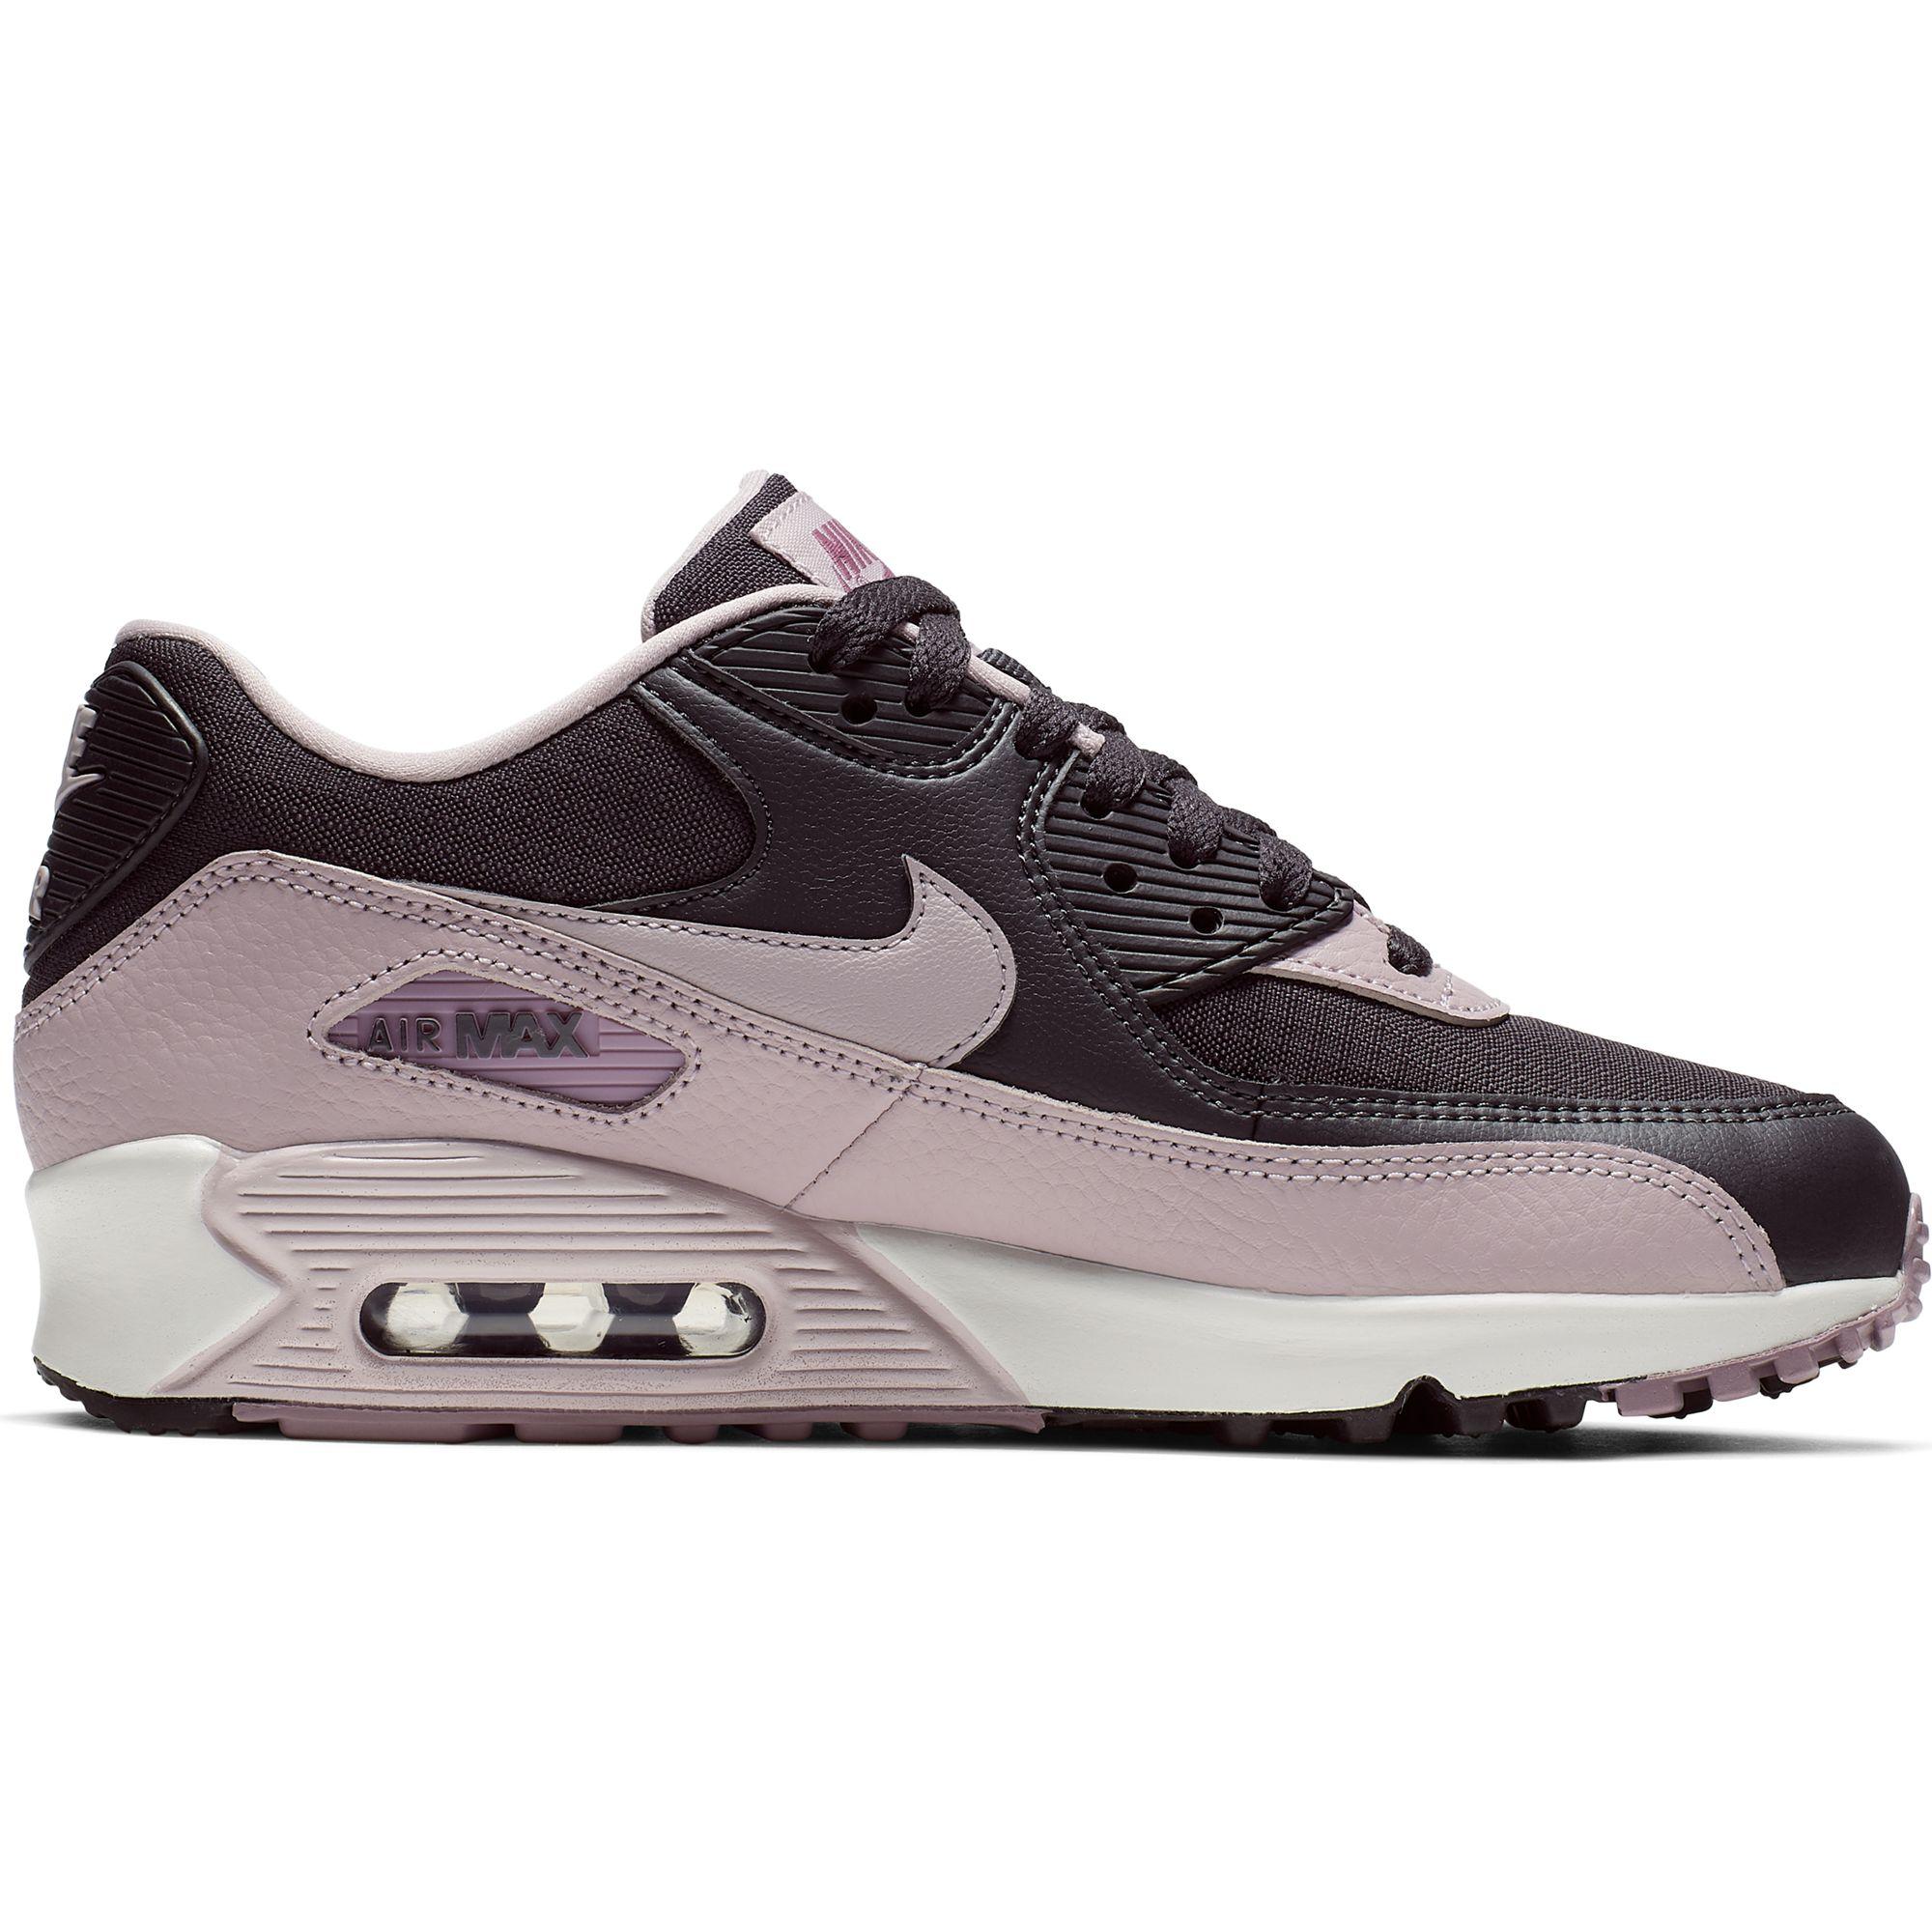 sports shoes 9d999 21c9d Details about Nike Women's Air Max 90 Sneakers, Oil Grey/Plum Chalk-Plum  Dust